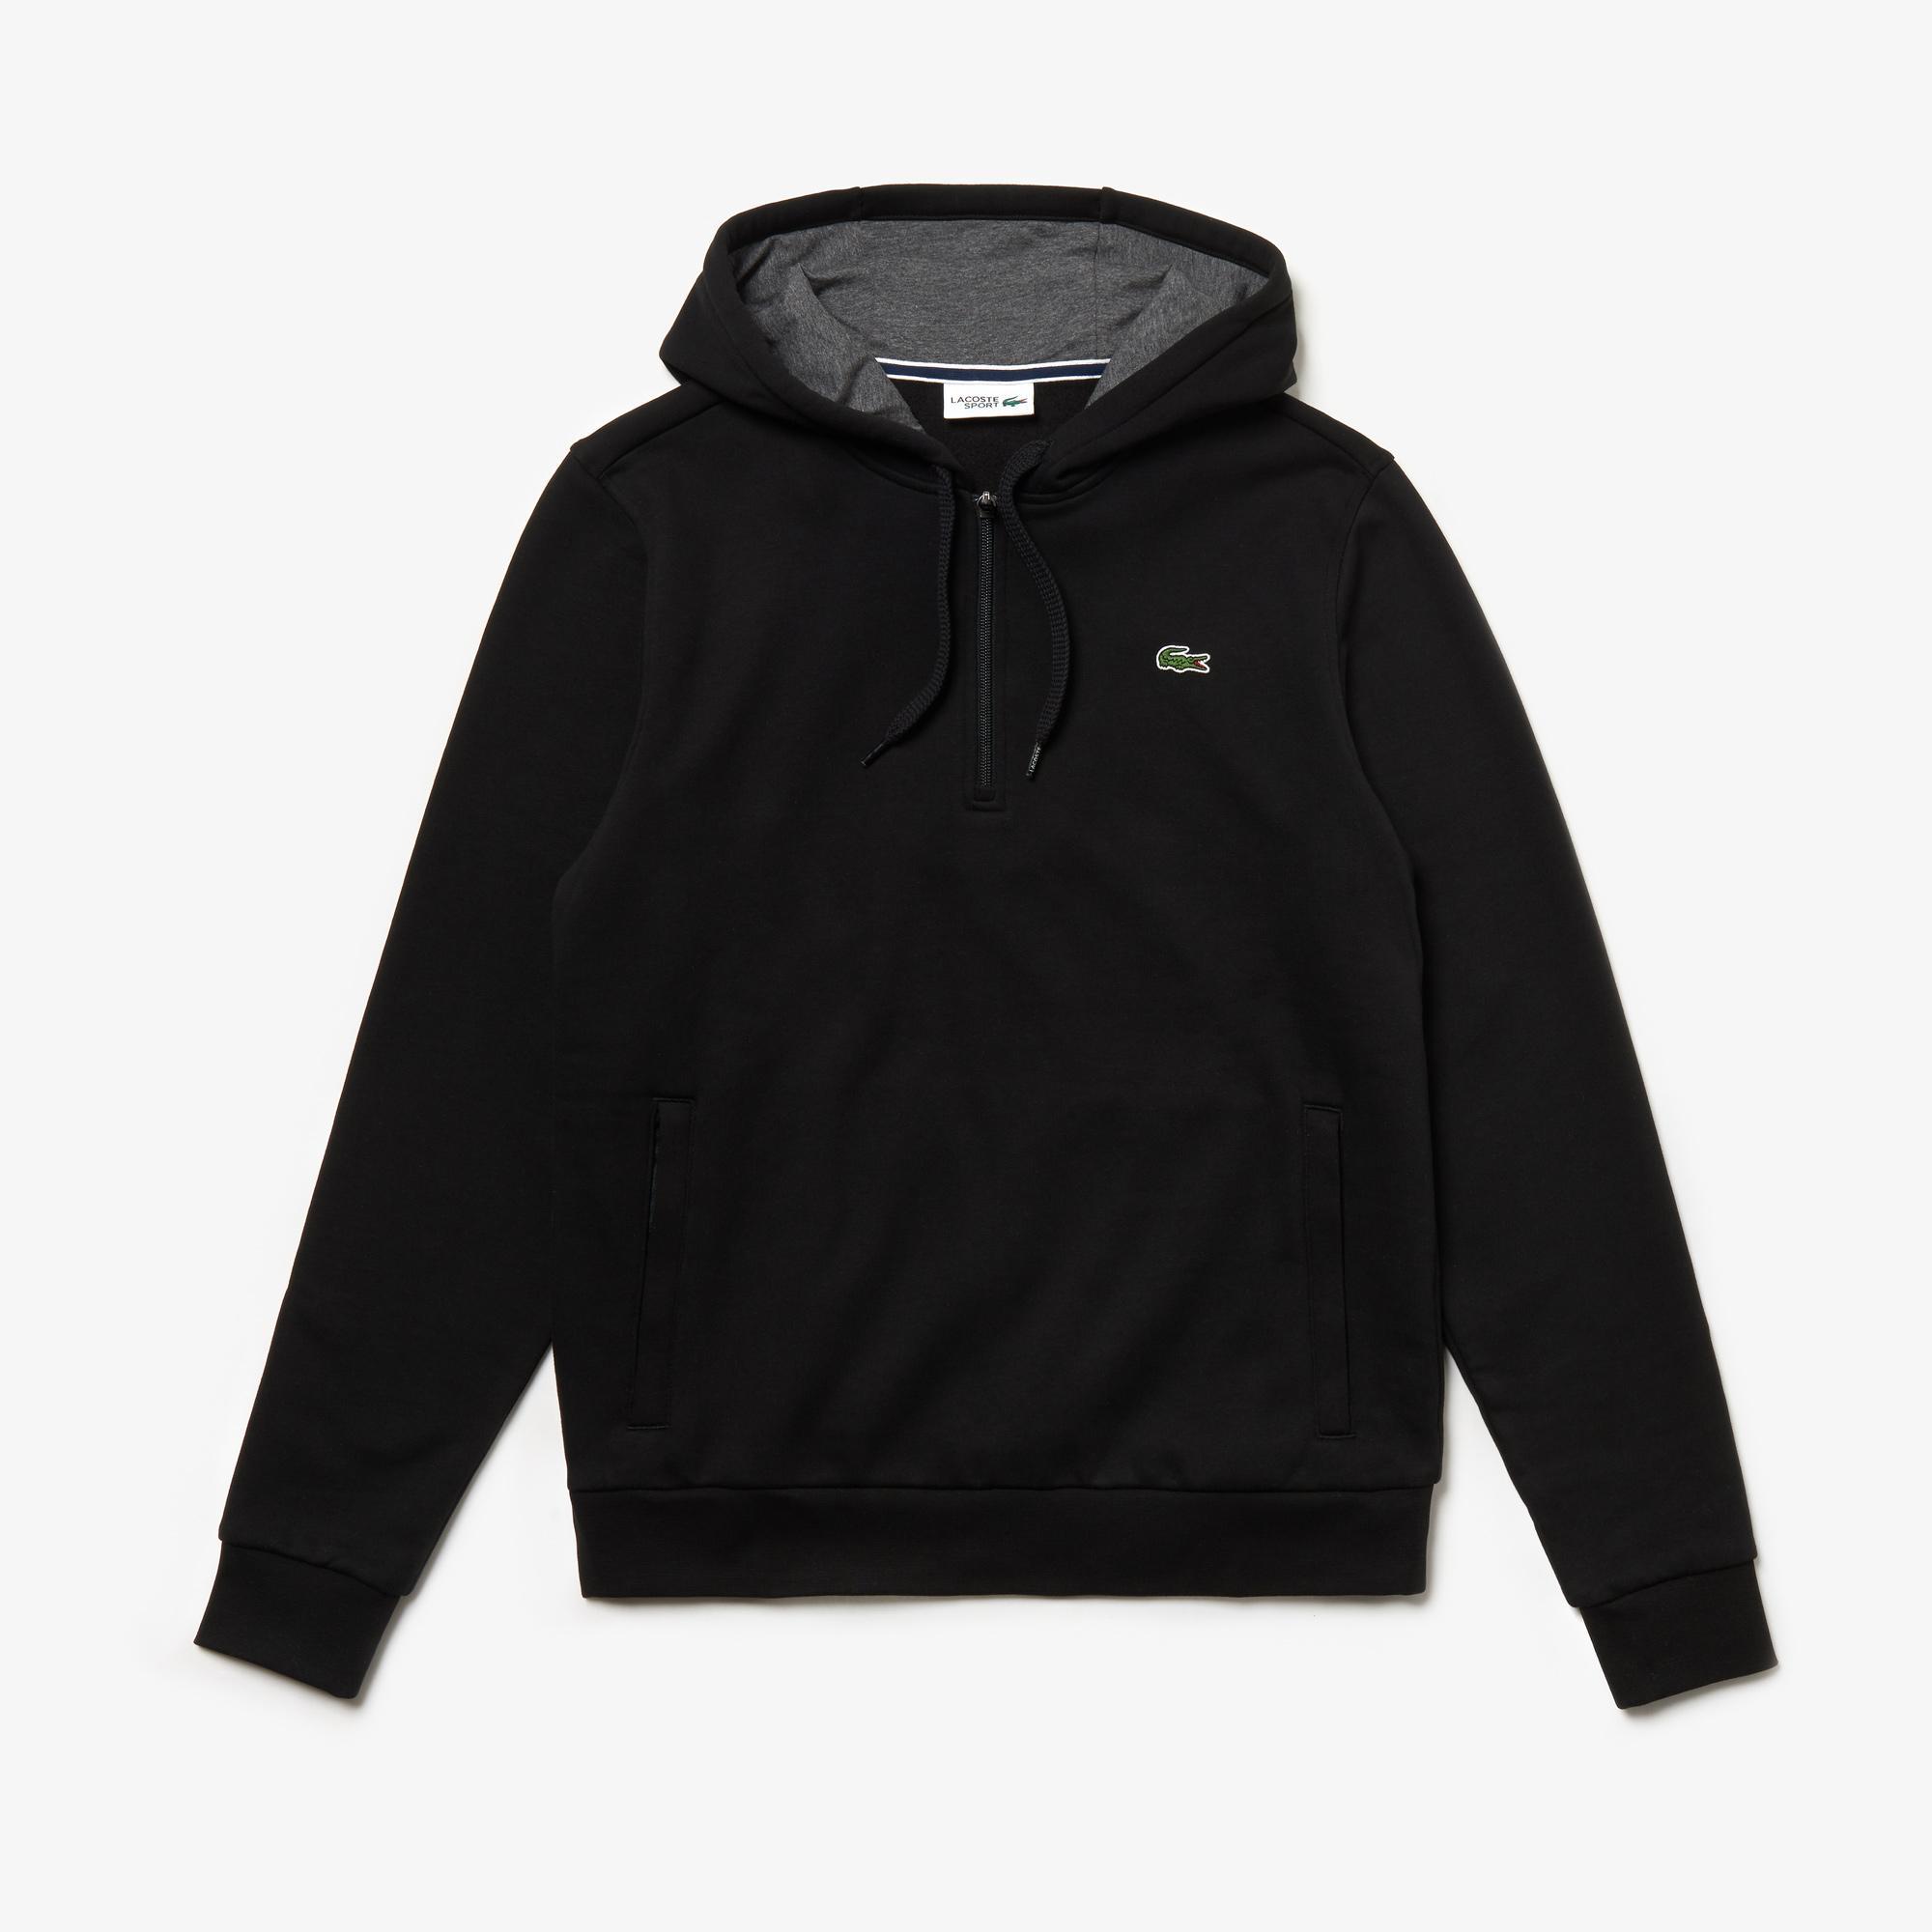 Lacoste Sport Erkek Kapüşonlu Siyah Sweatshirt